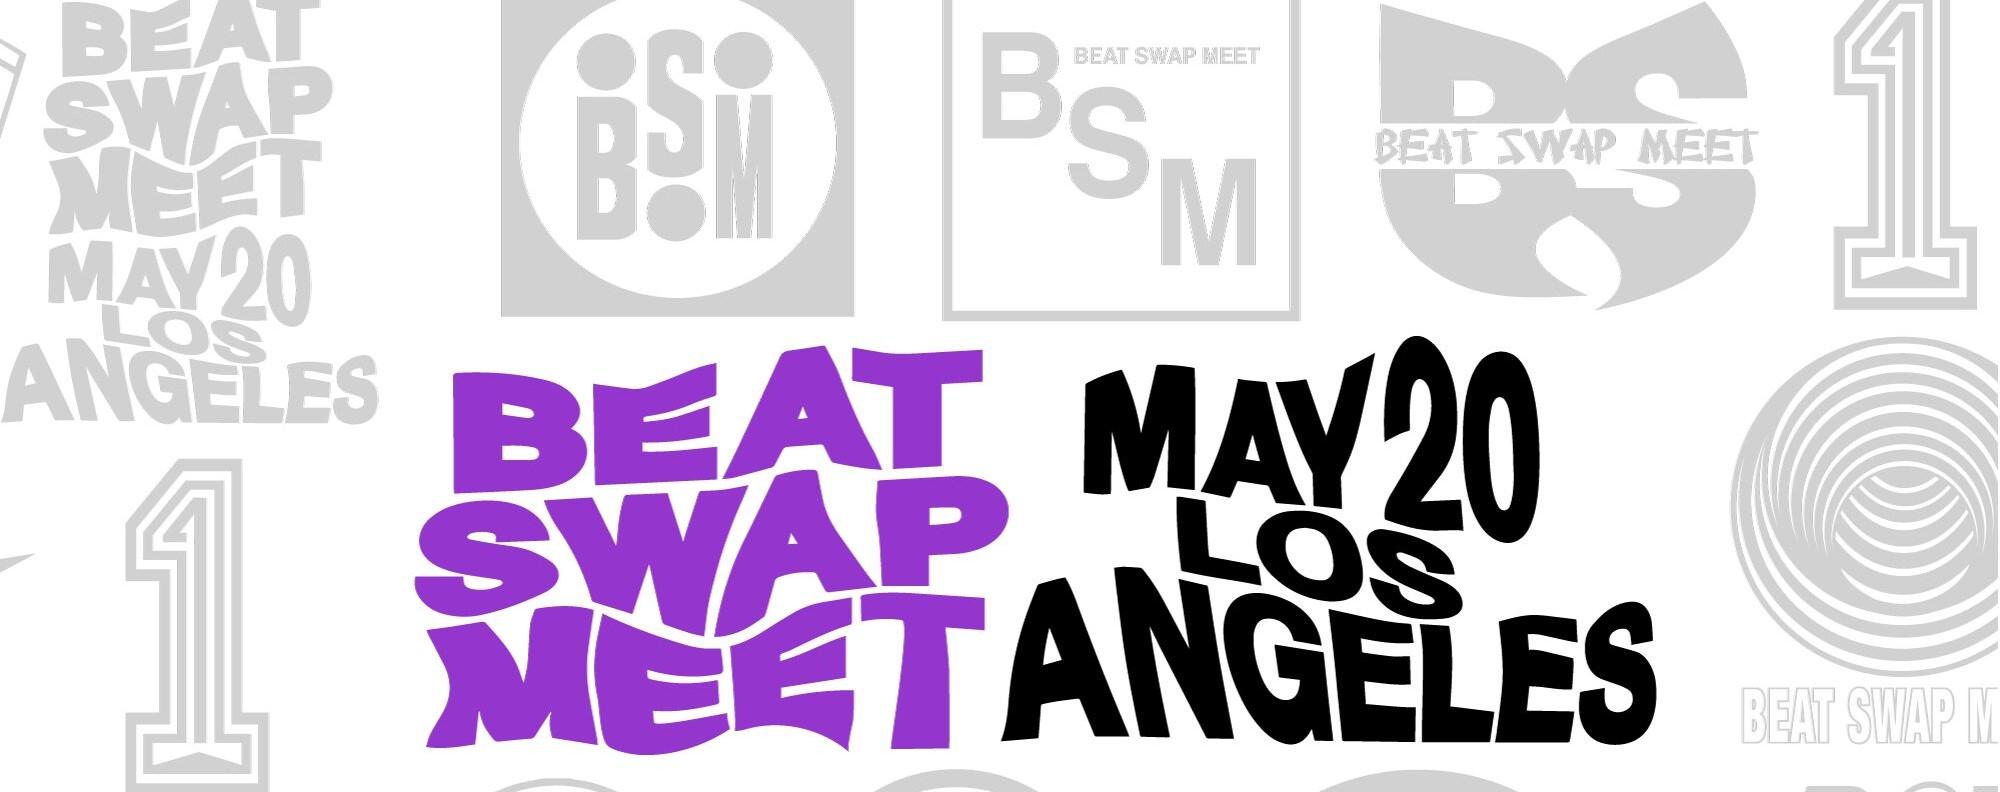 Swap_Meet_and_Flea_Market_ATM_Rental_Company_Los_Angeles_California.jpeg